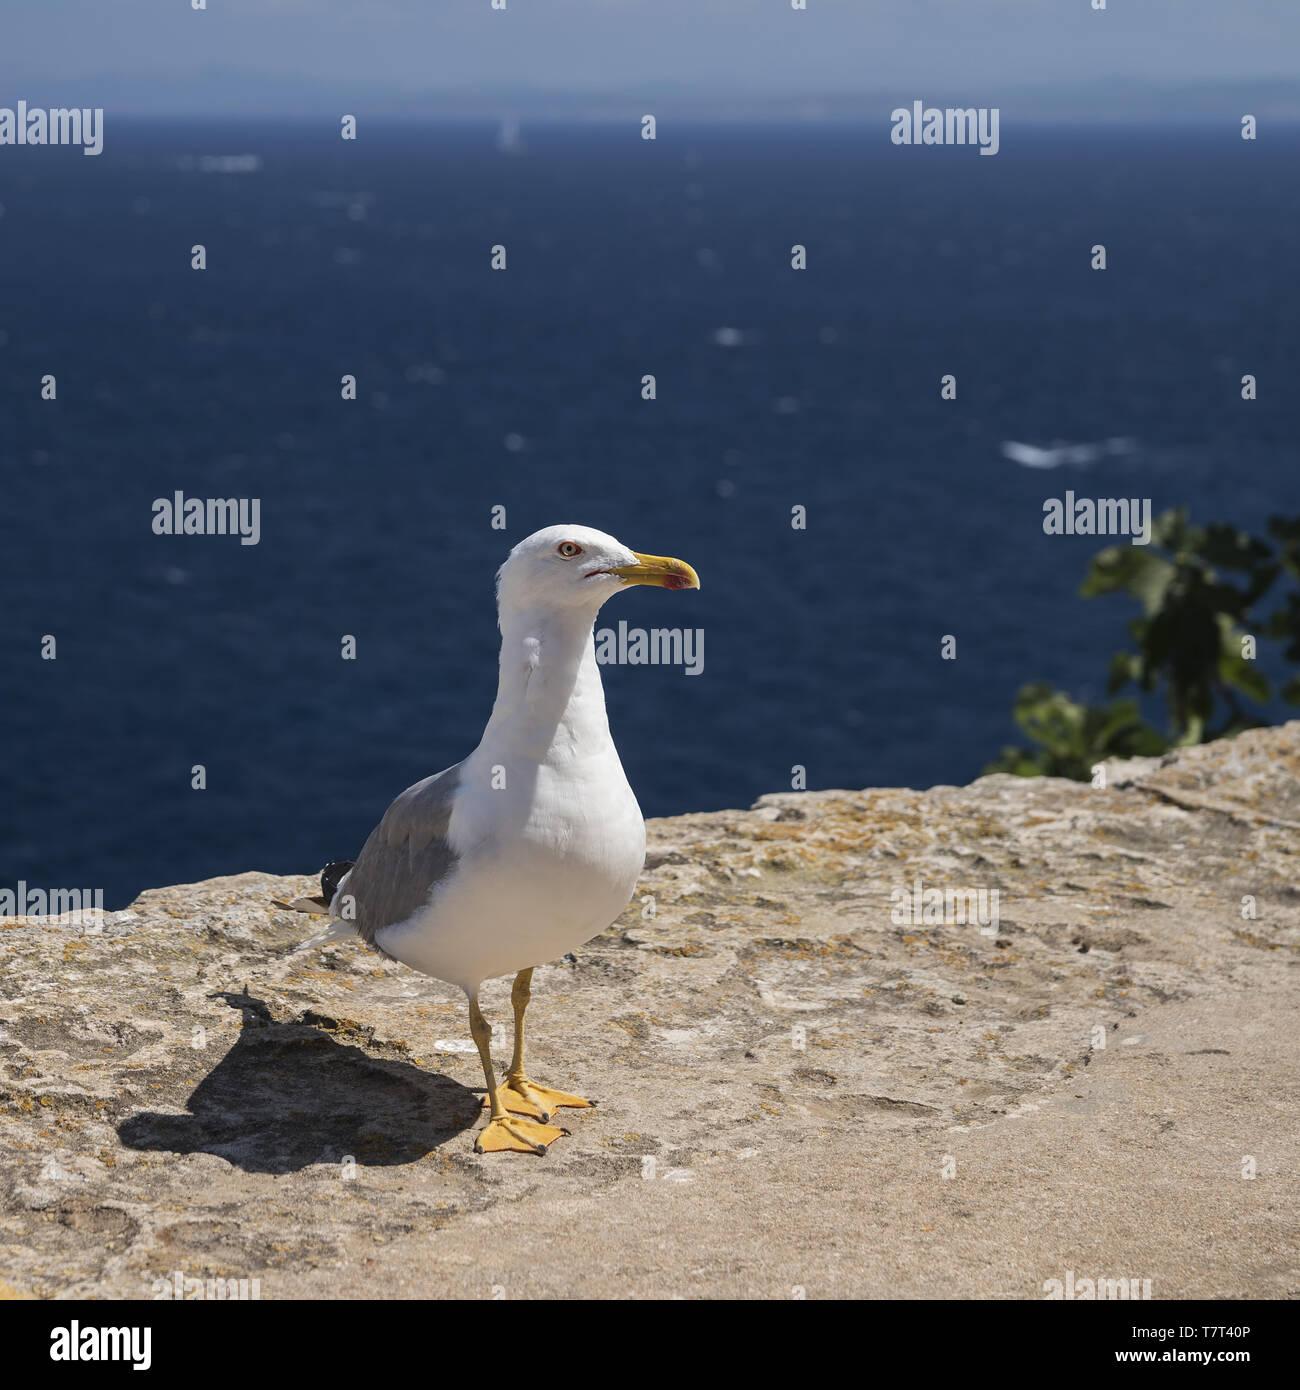 Yellow-legged gull (Larus michahellis) close-up on the background of the sea. Mittelmeermöwe Nahaufnahme auf dem Hintergrund des Meeres. Mewa romańska Stock Photo